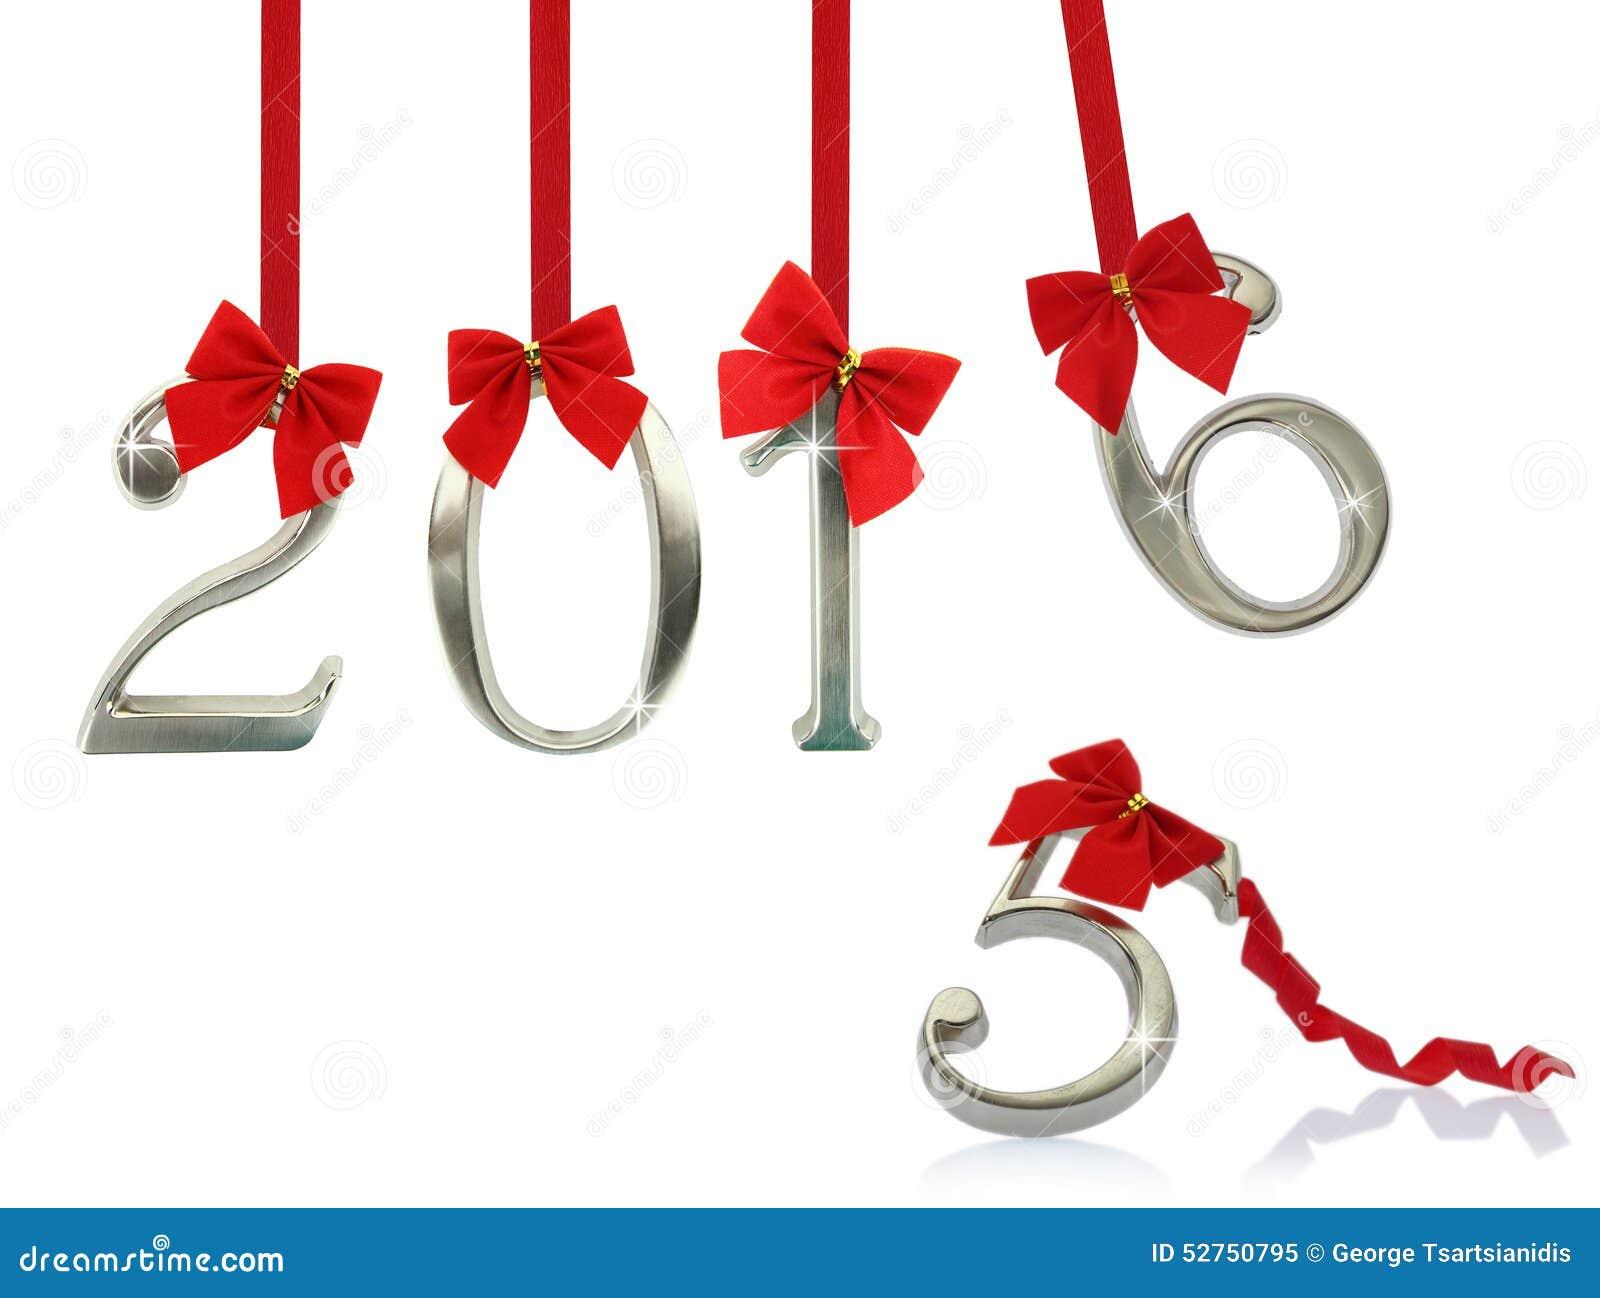 New year 2016 stock photo image 58693644 - Neues Jahr 2016 Lizenzfreies Stockfoto